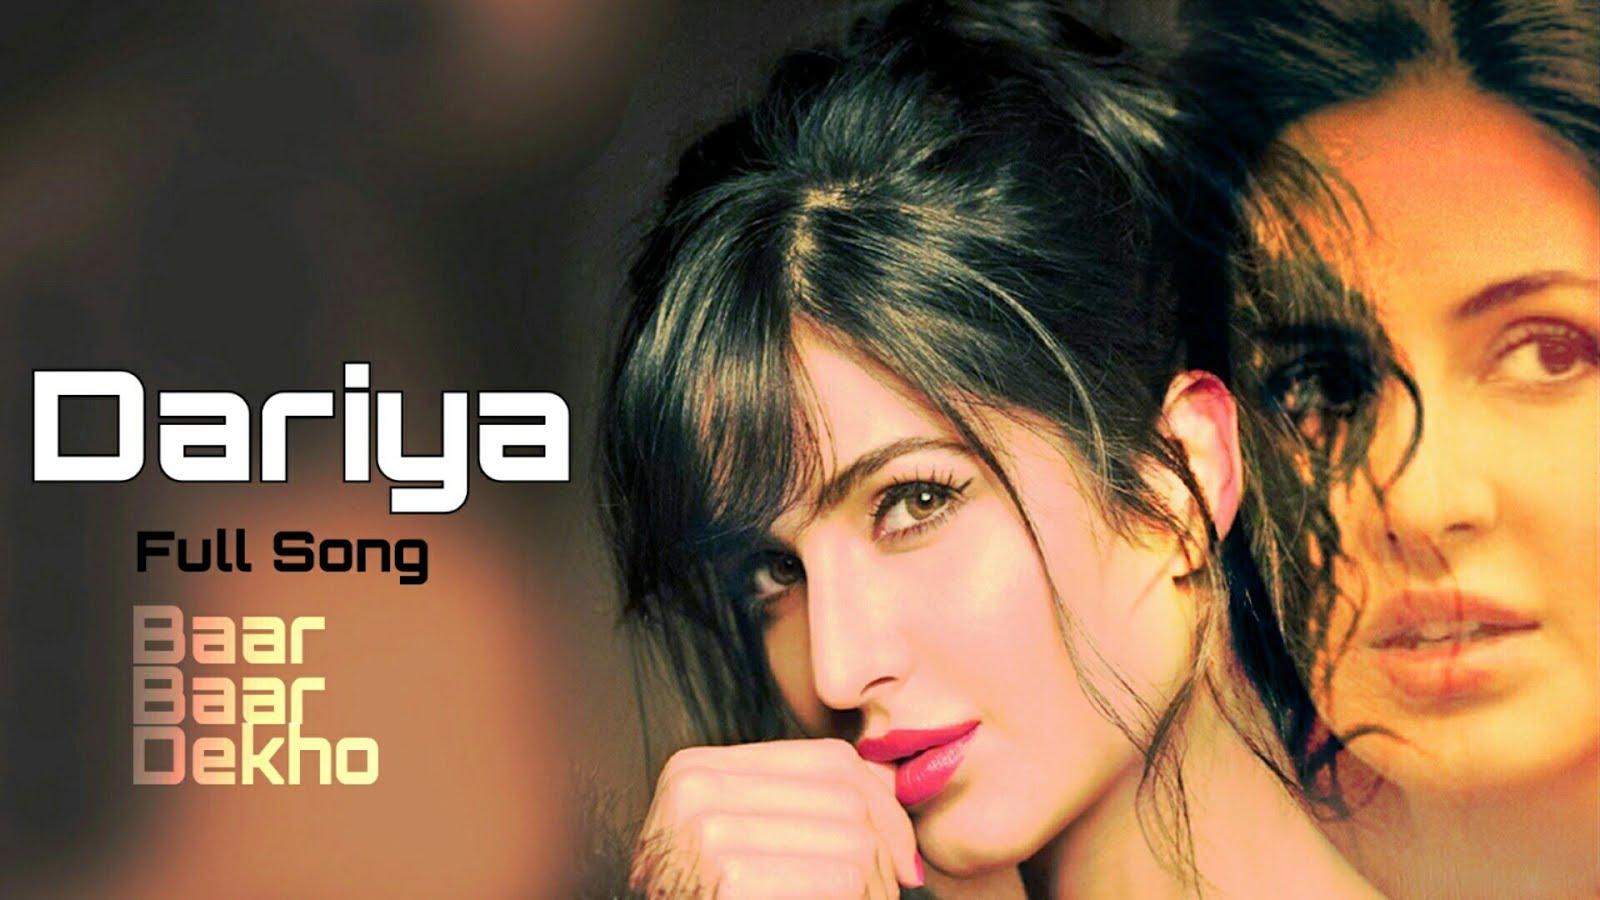 Hindi Songs Lyrics Dariya Full Song Lyrics Baar Baar Dekho Hindi Movie